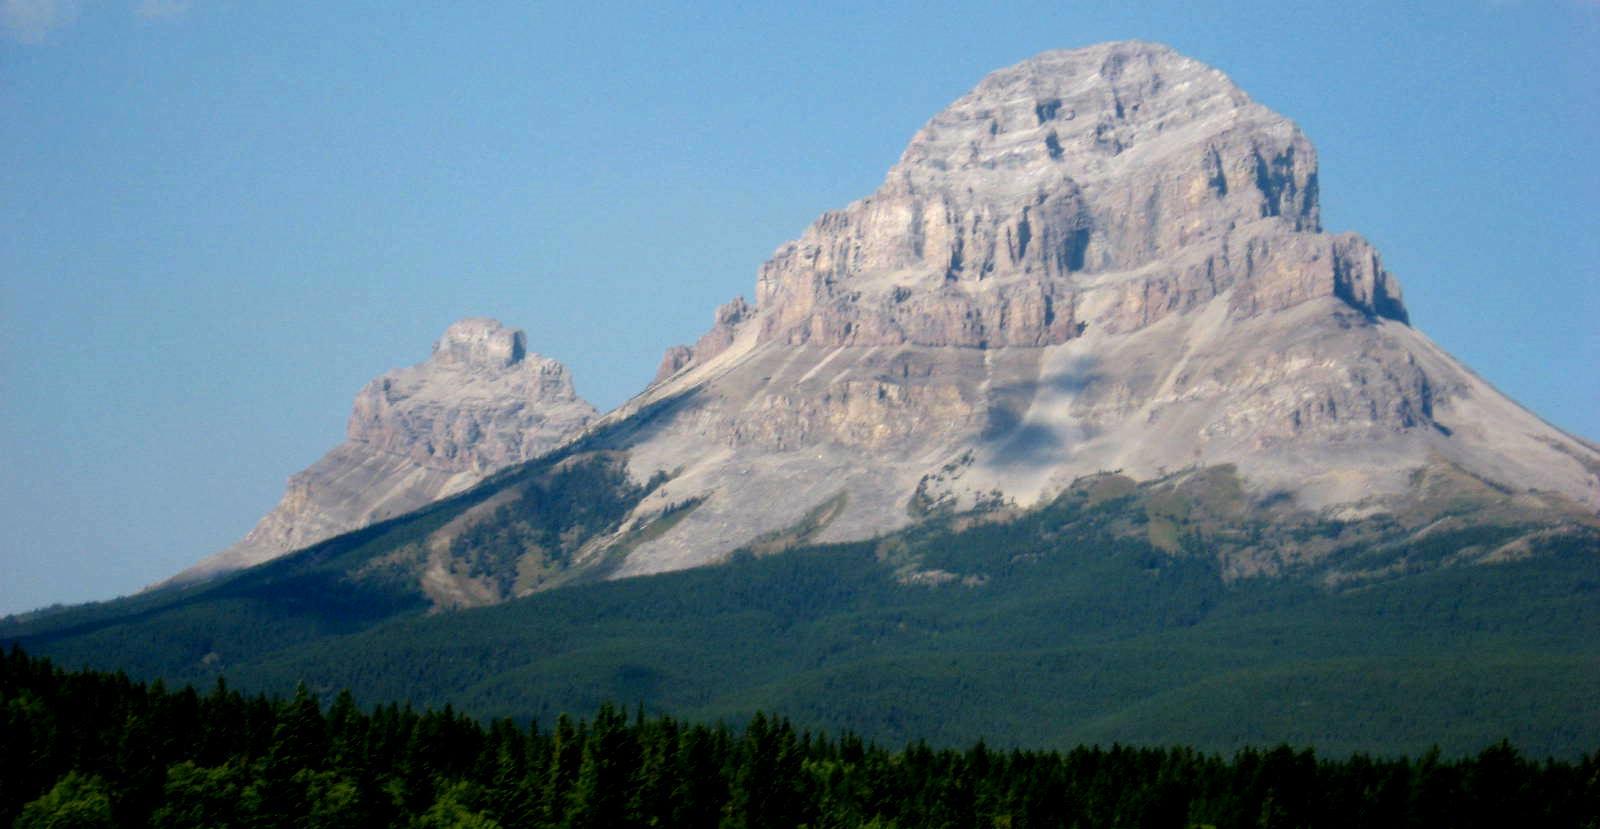 CANADA ROCKS THE GEOLOGIC JOURNEY EBOOK DOWNLOAD